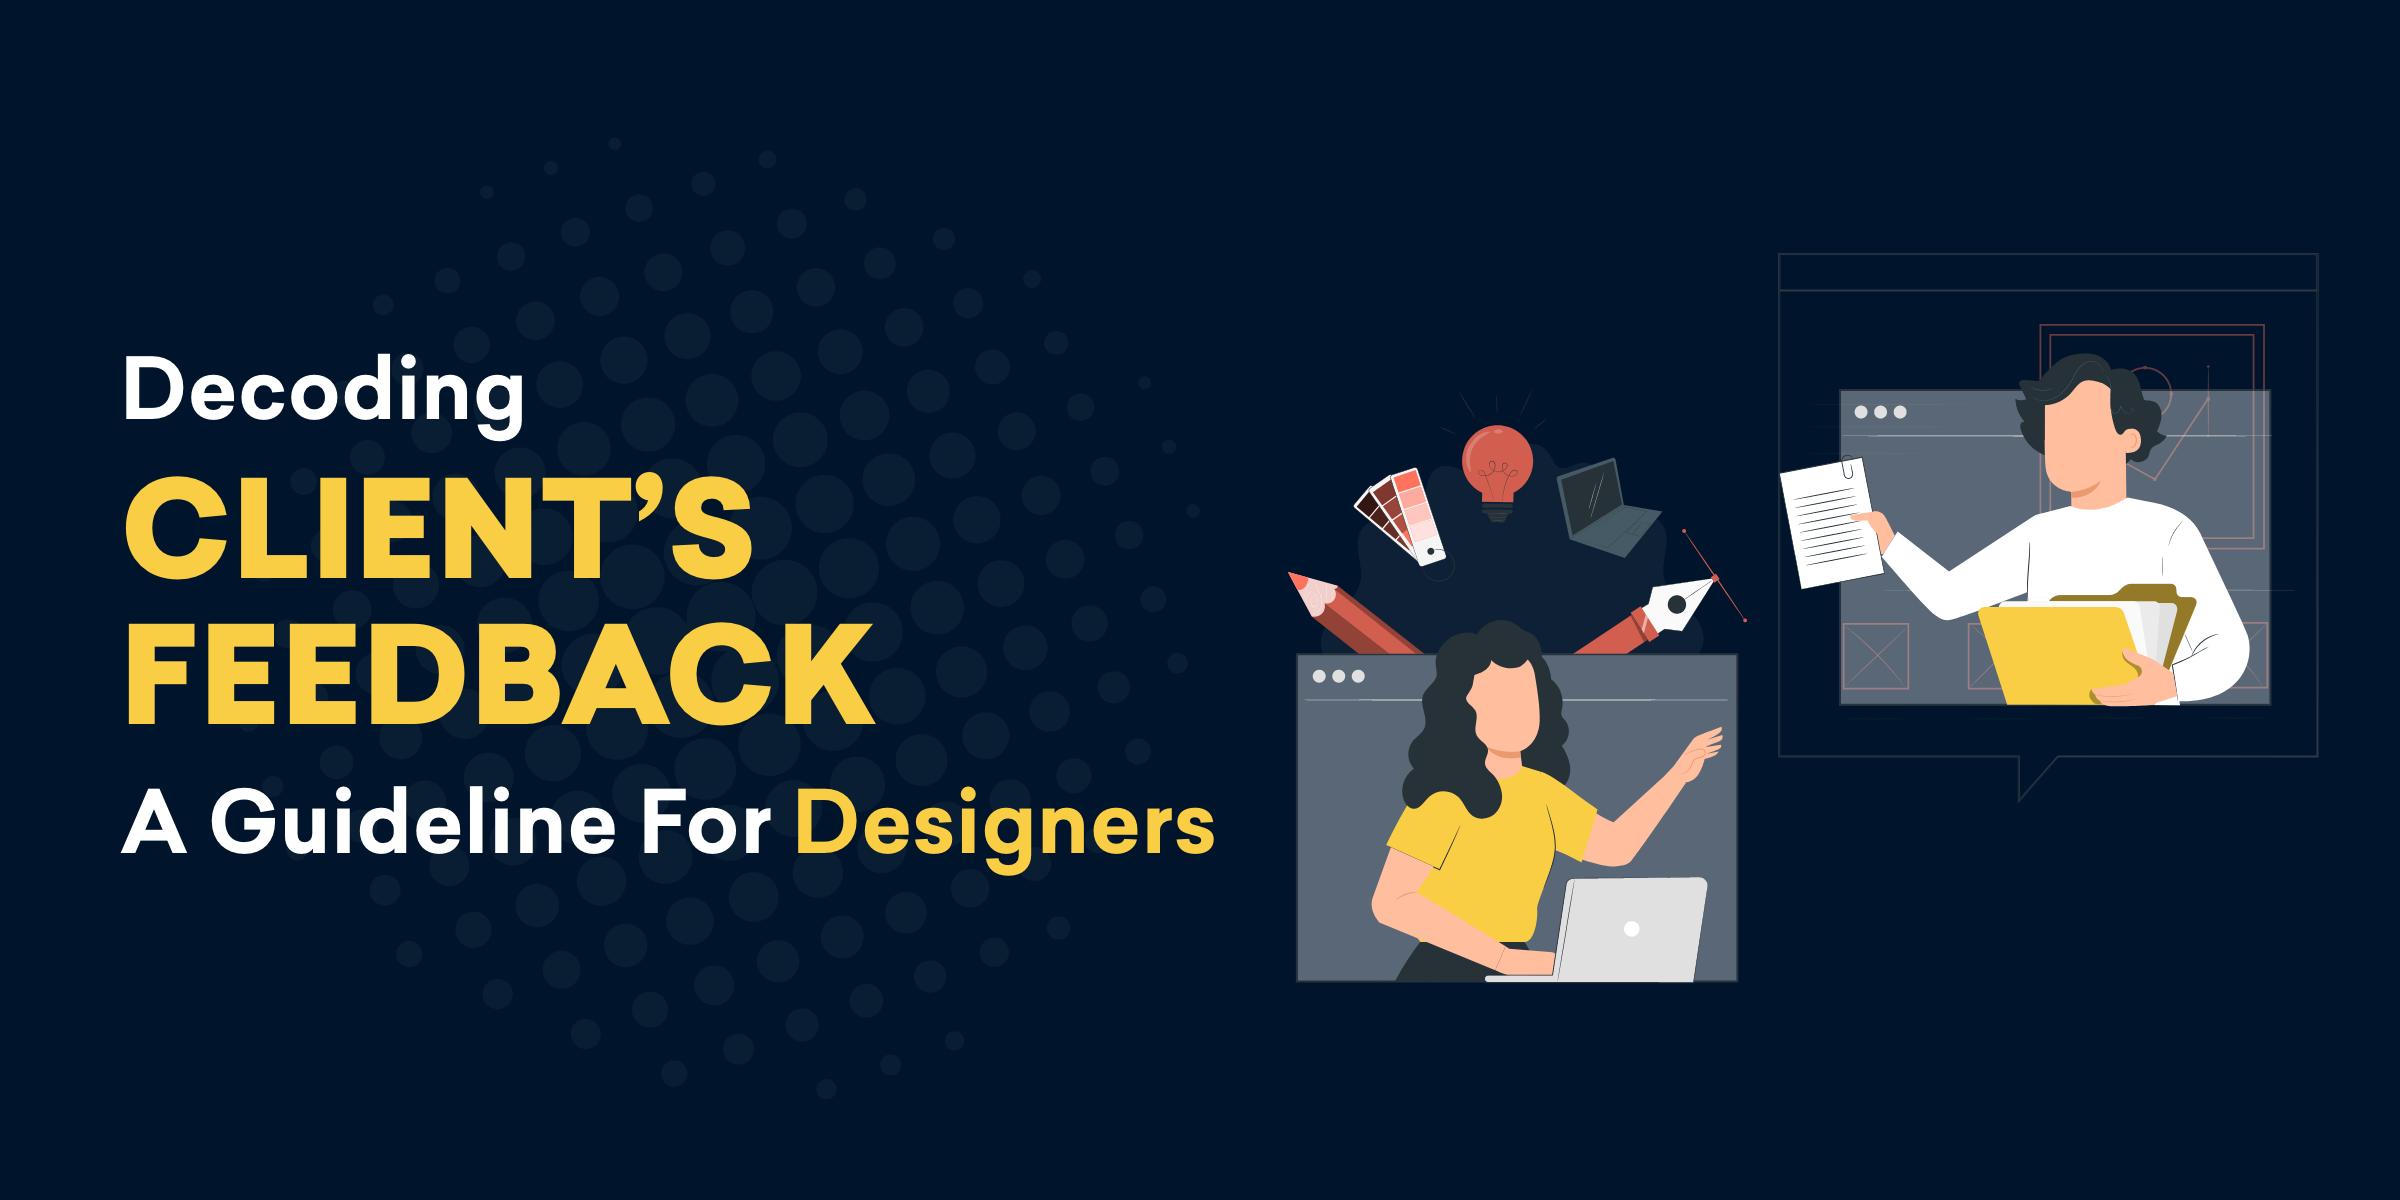 Decoding design feedback